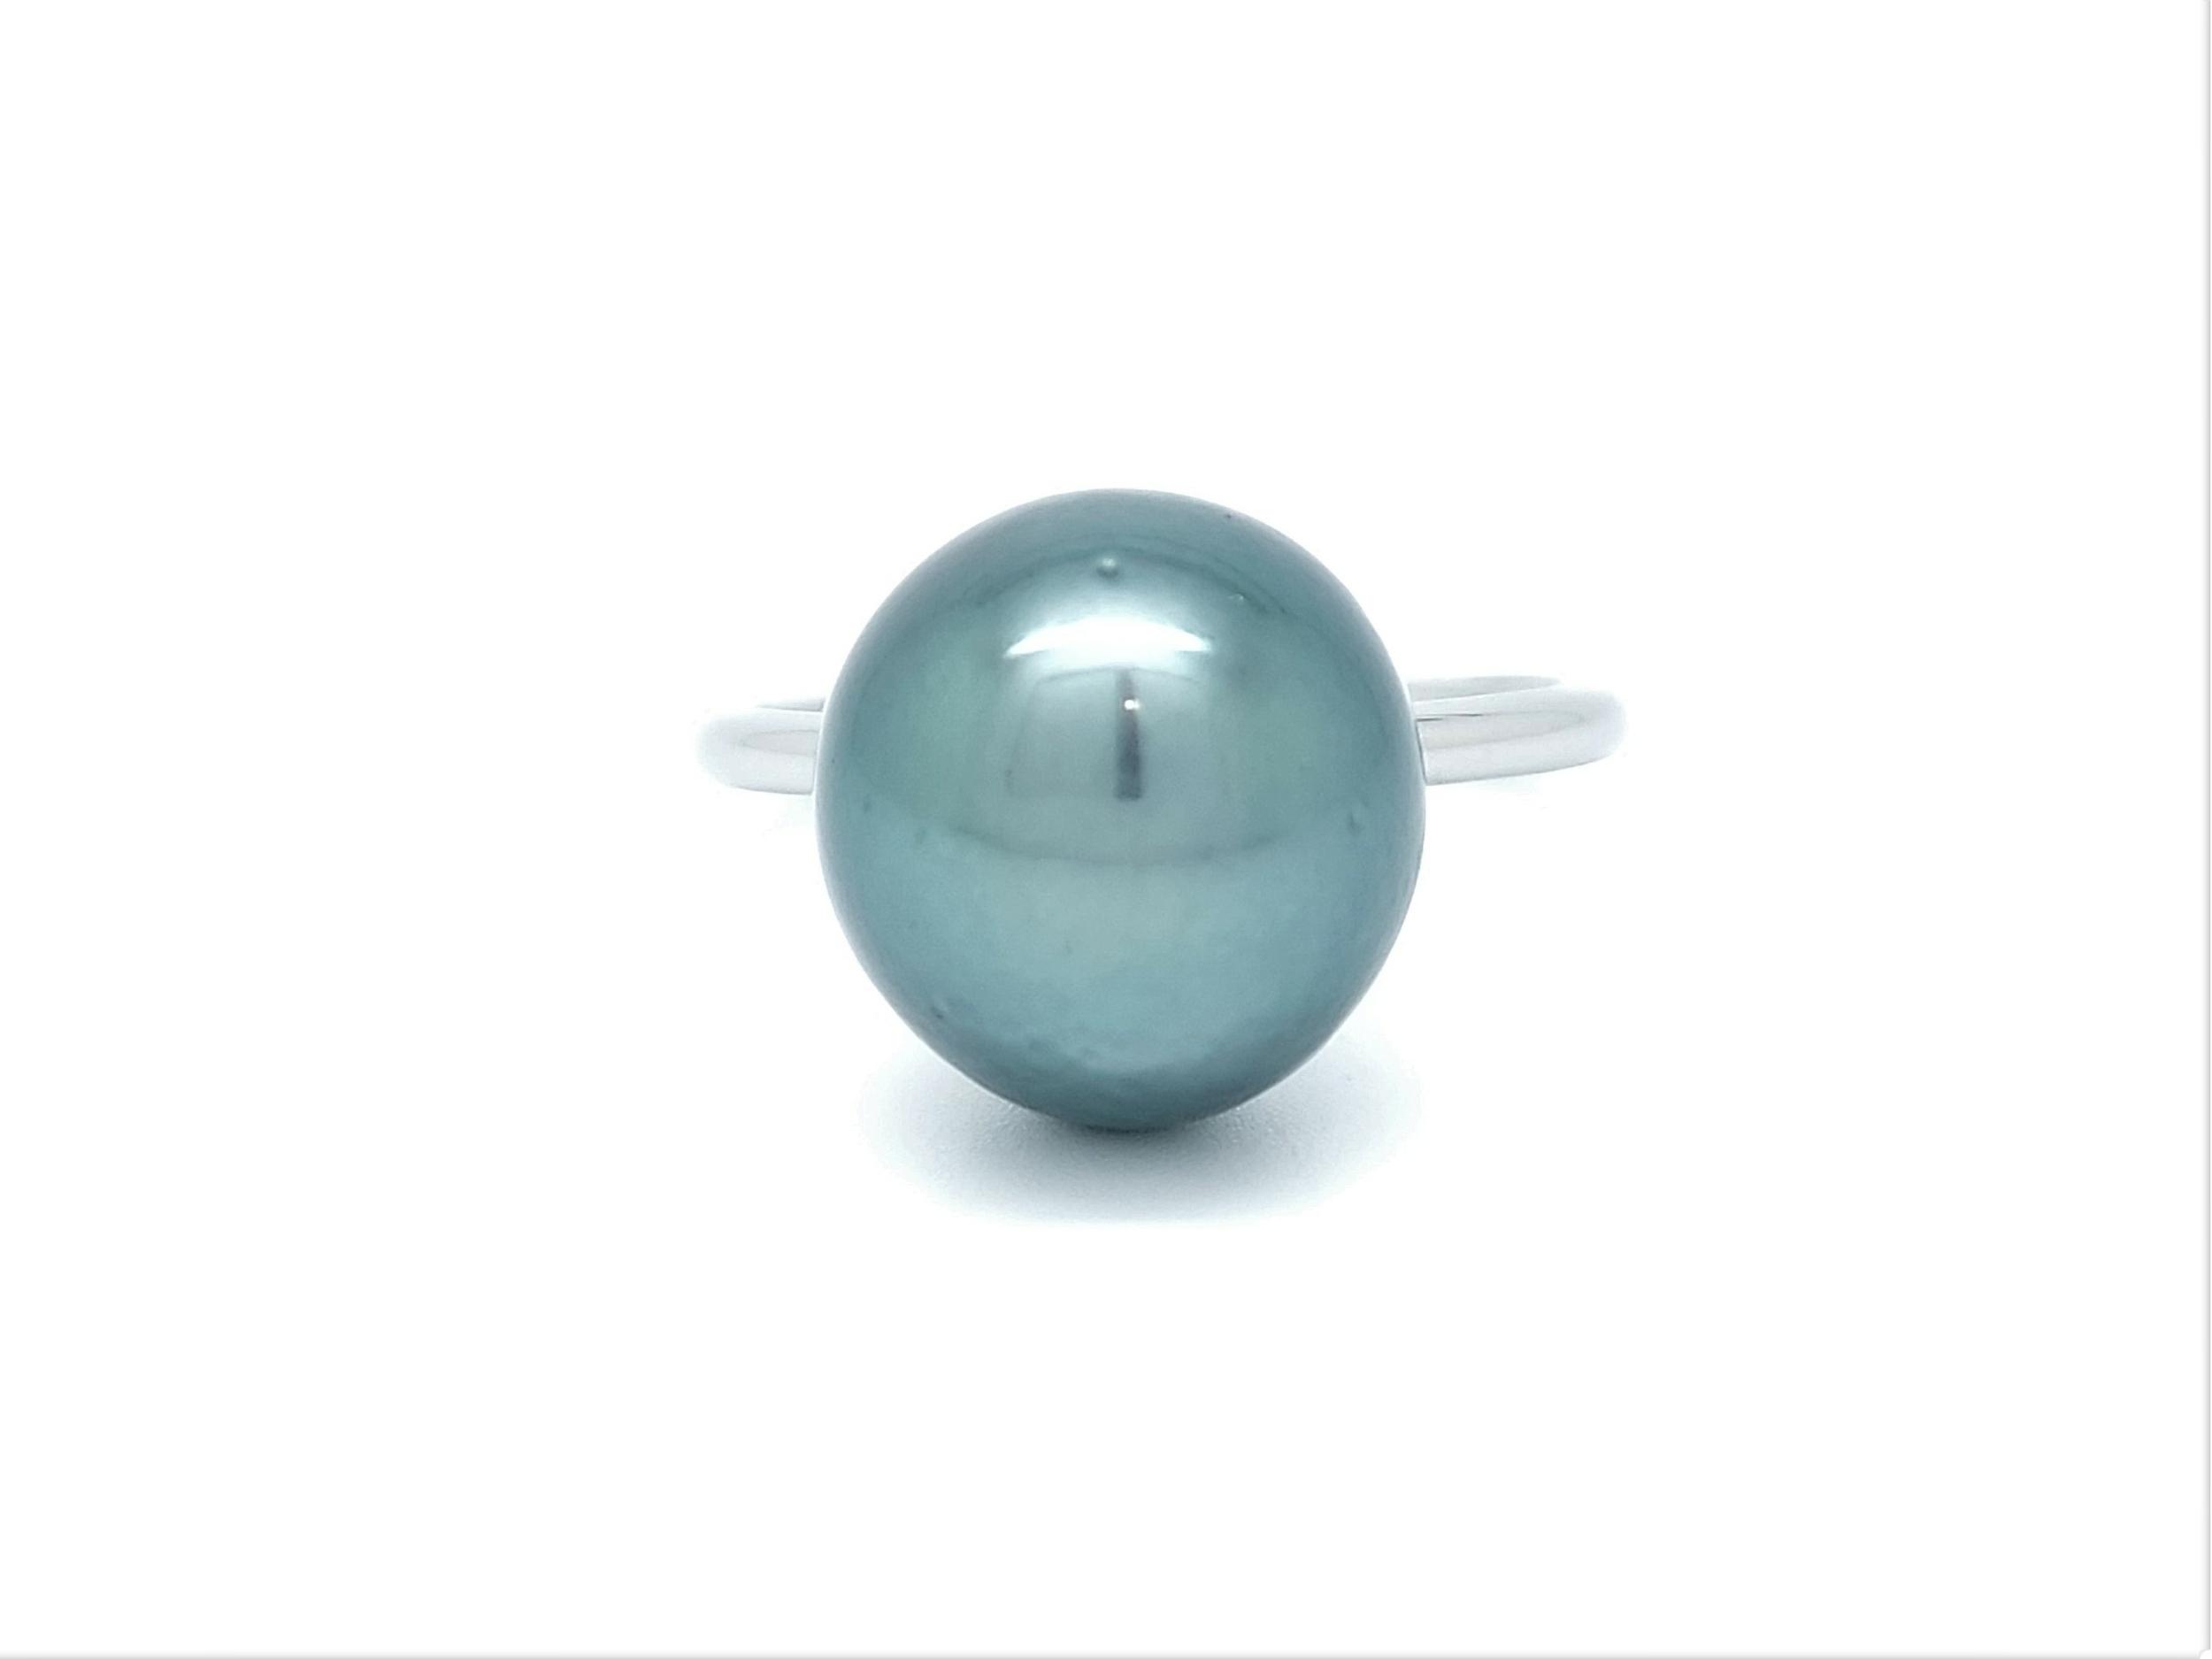 Bague essentiel en acier 1 perle de Tahiti de 12 mm de couleur bleu vert lagon